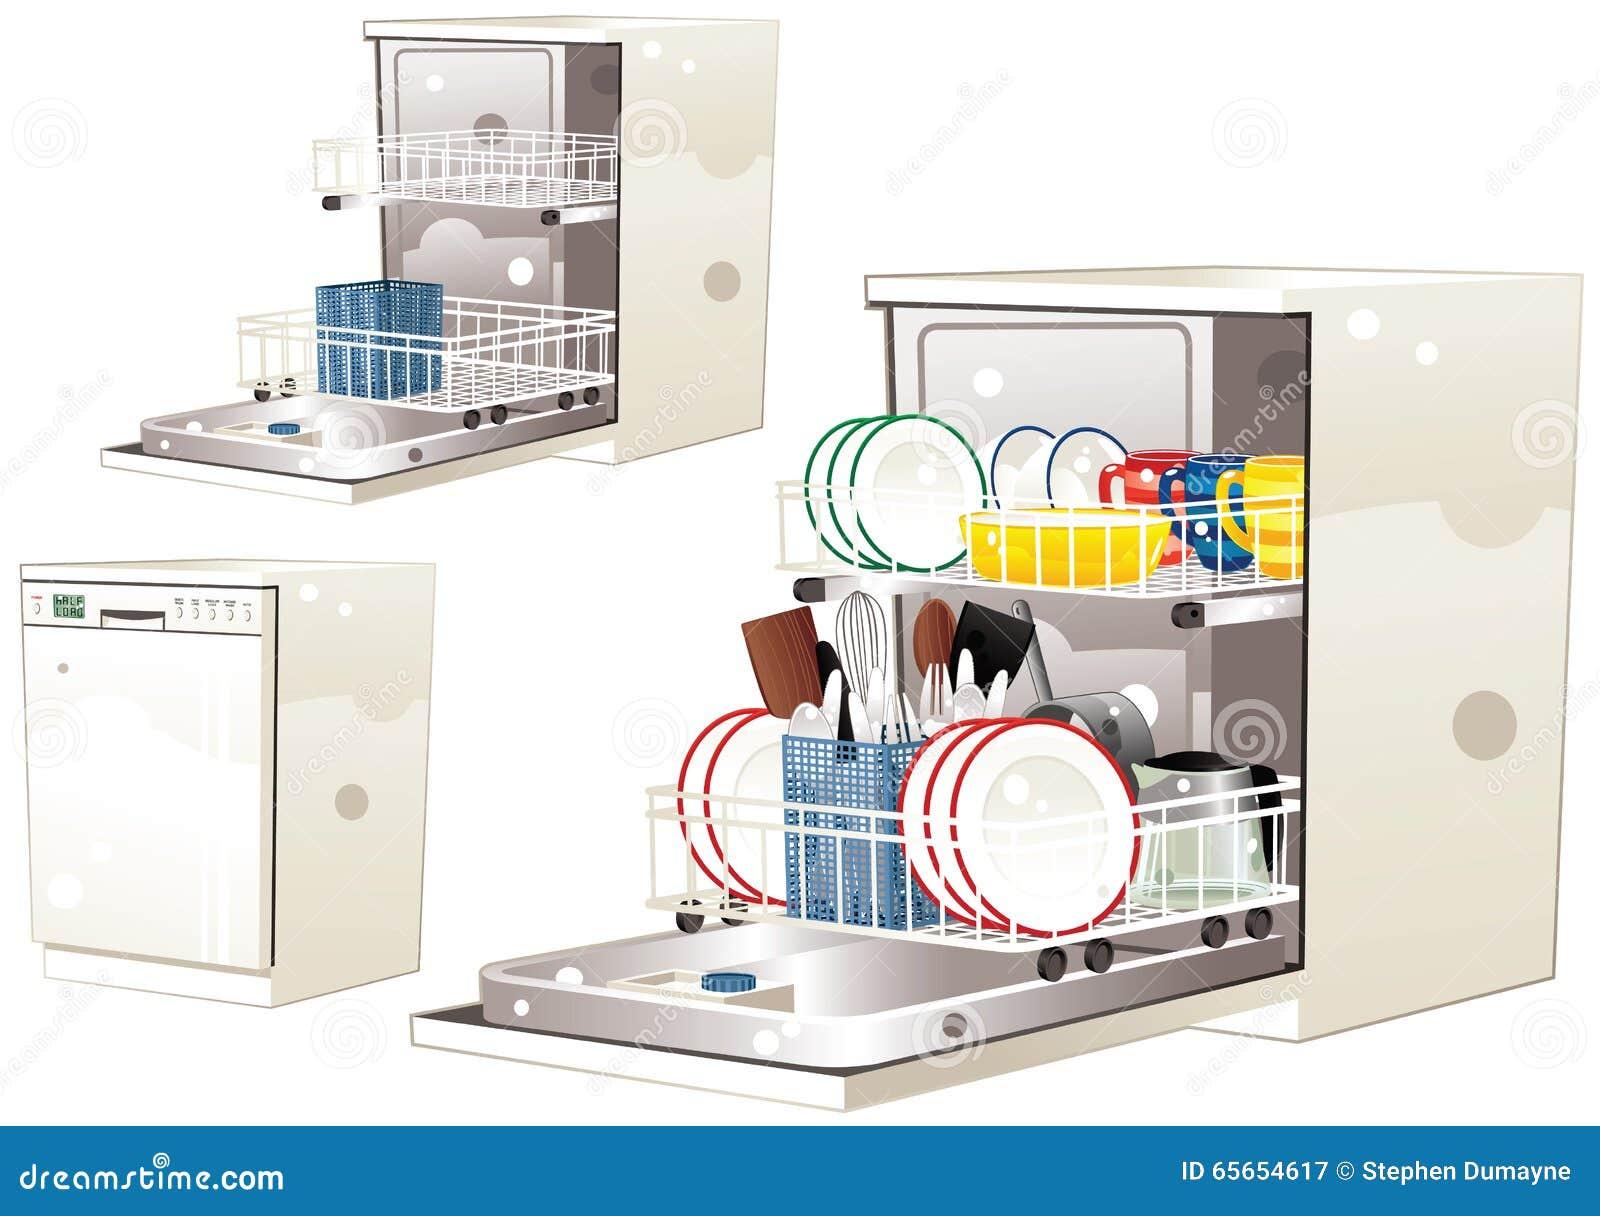 Dishwasher Clip Art ~ Dishwasher stock vector illustration of dishware